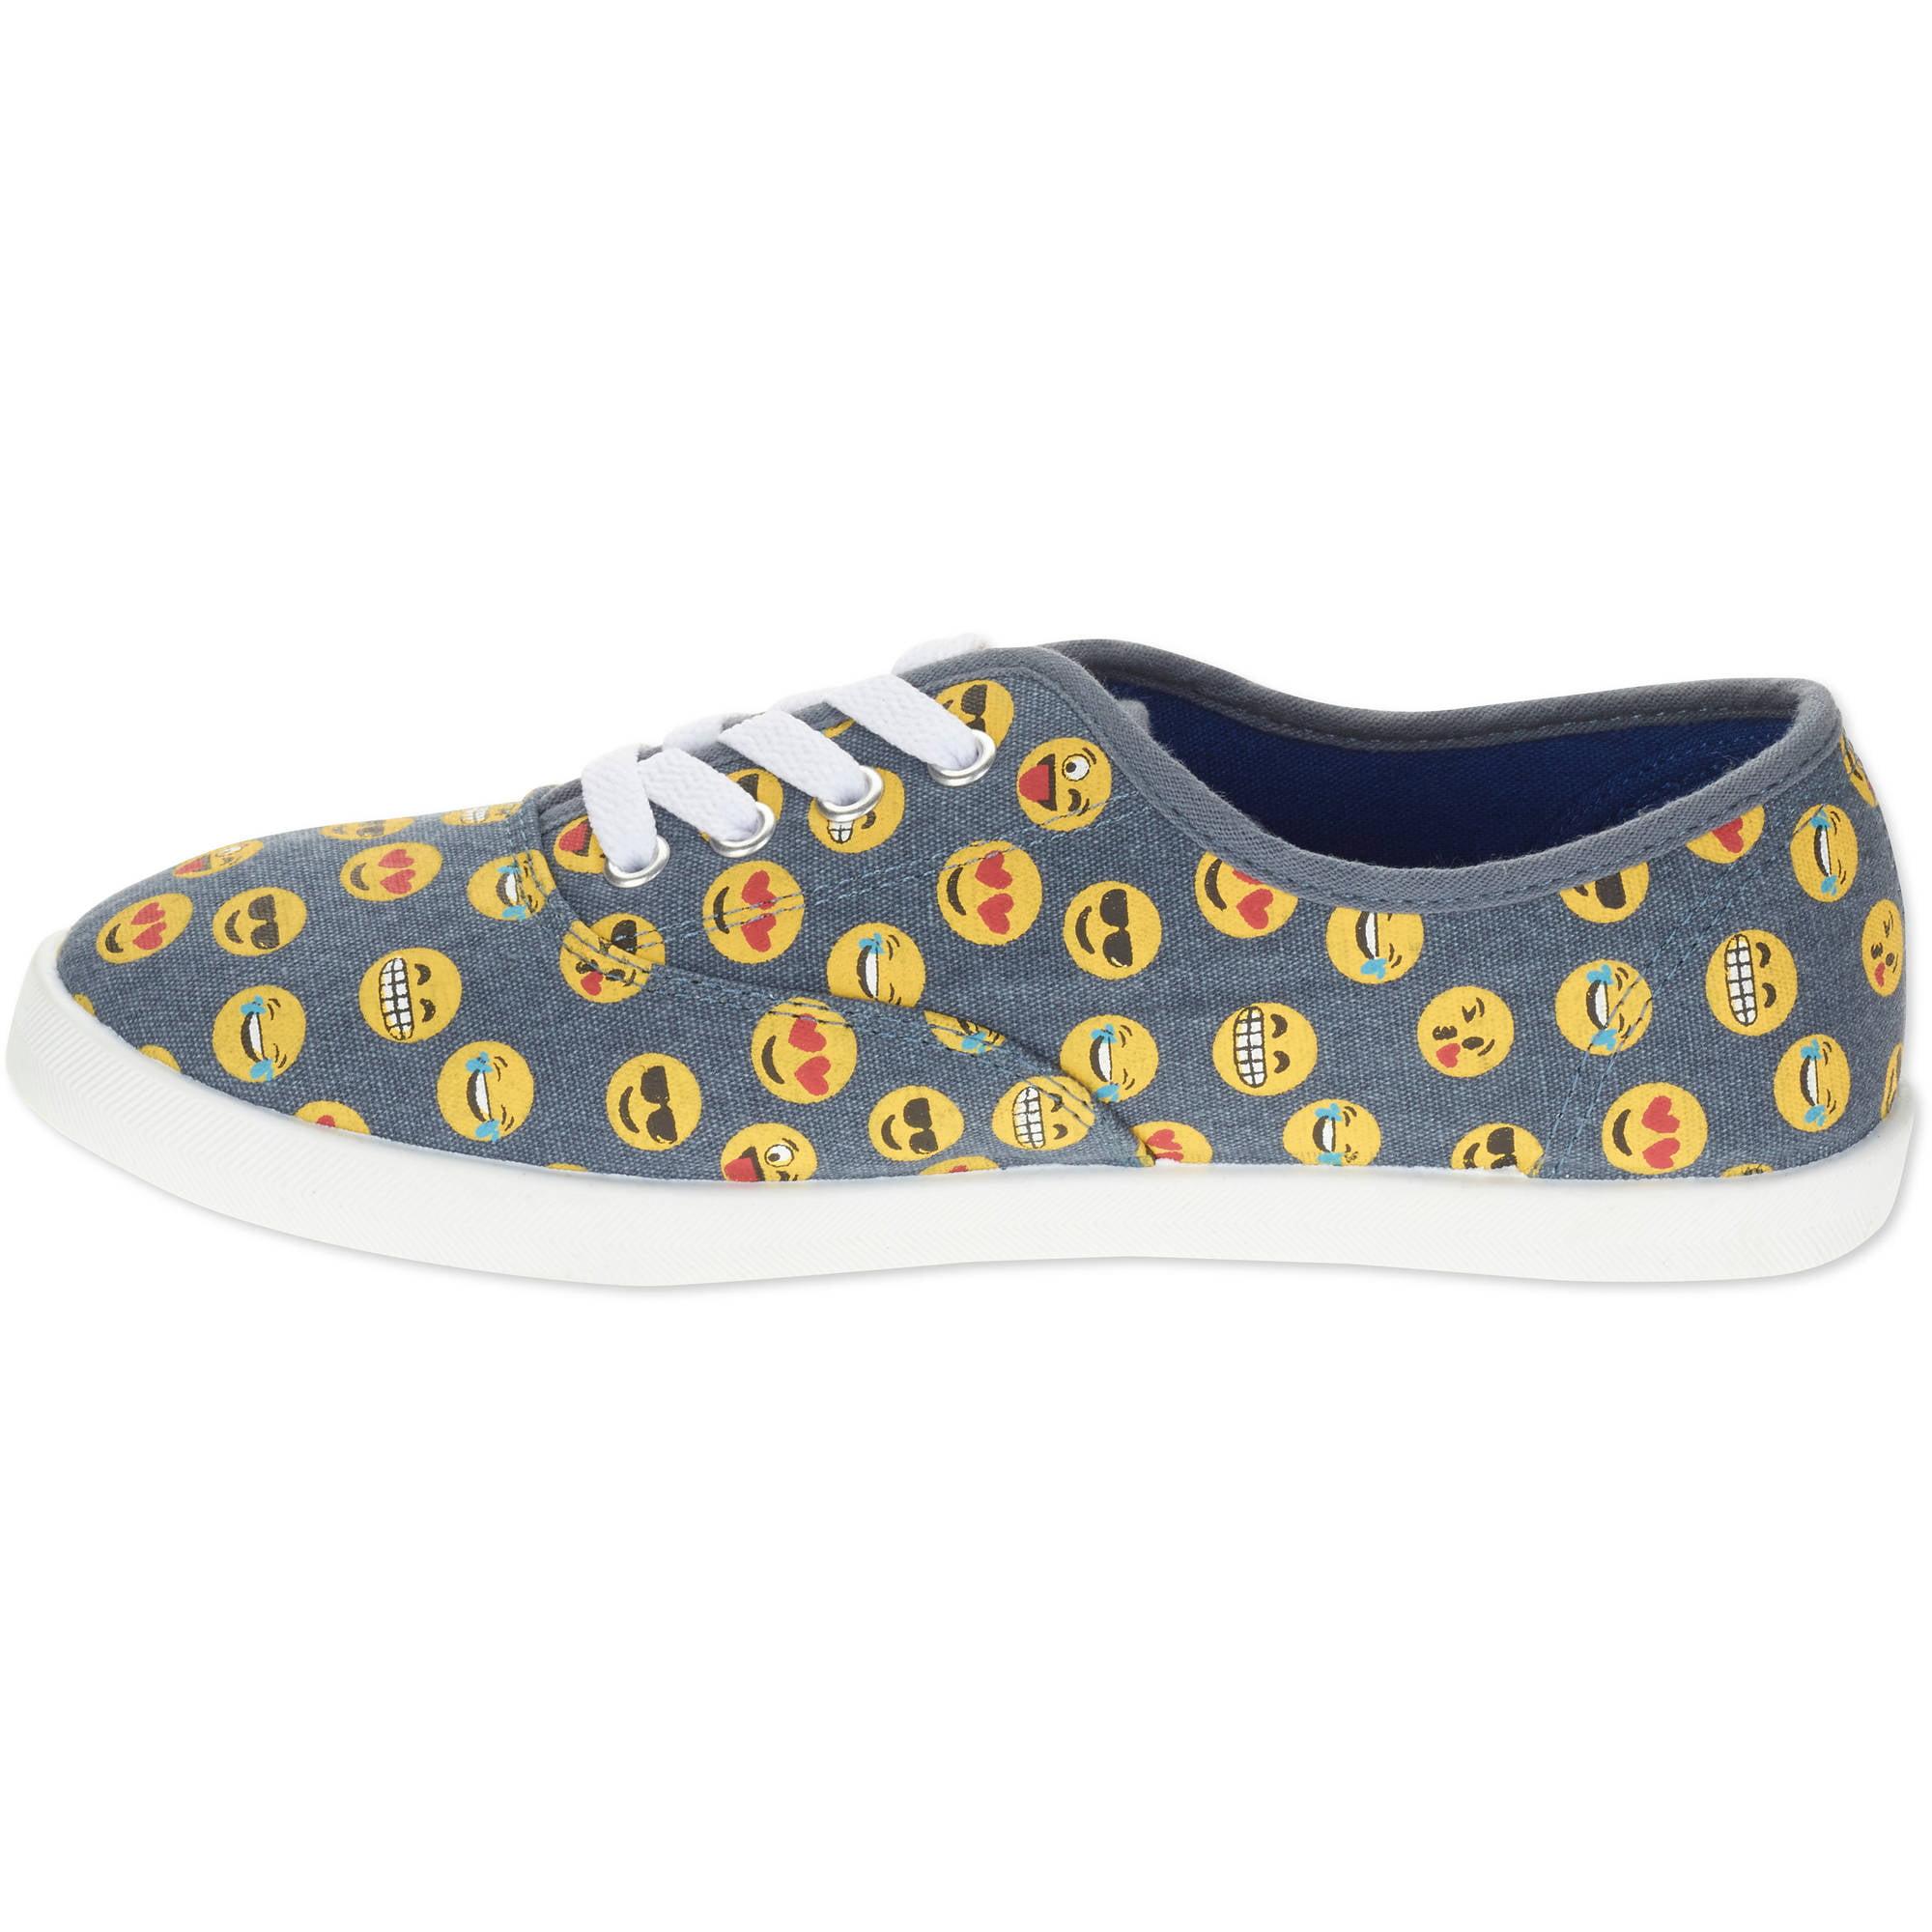 Walmart Non Resistant Girls Shoes